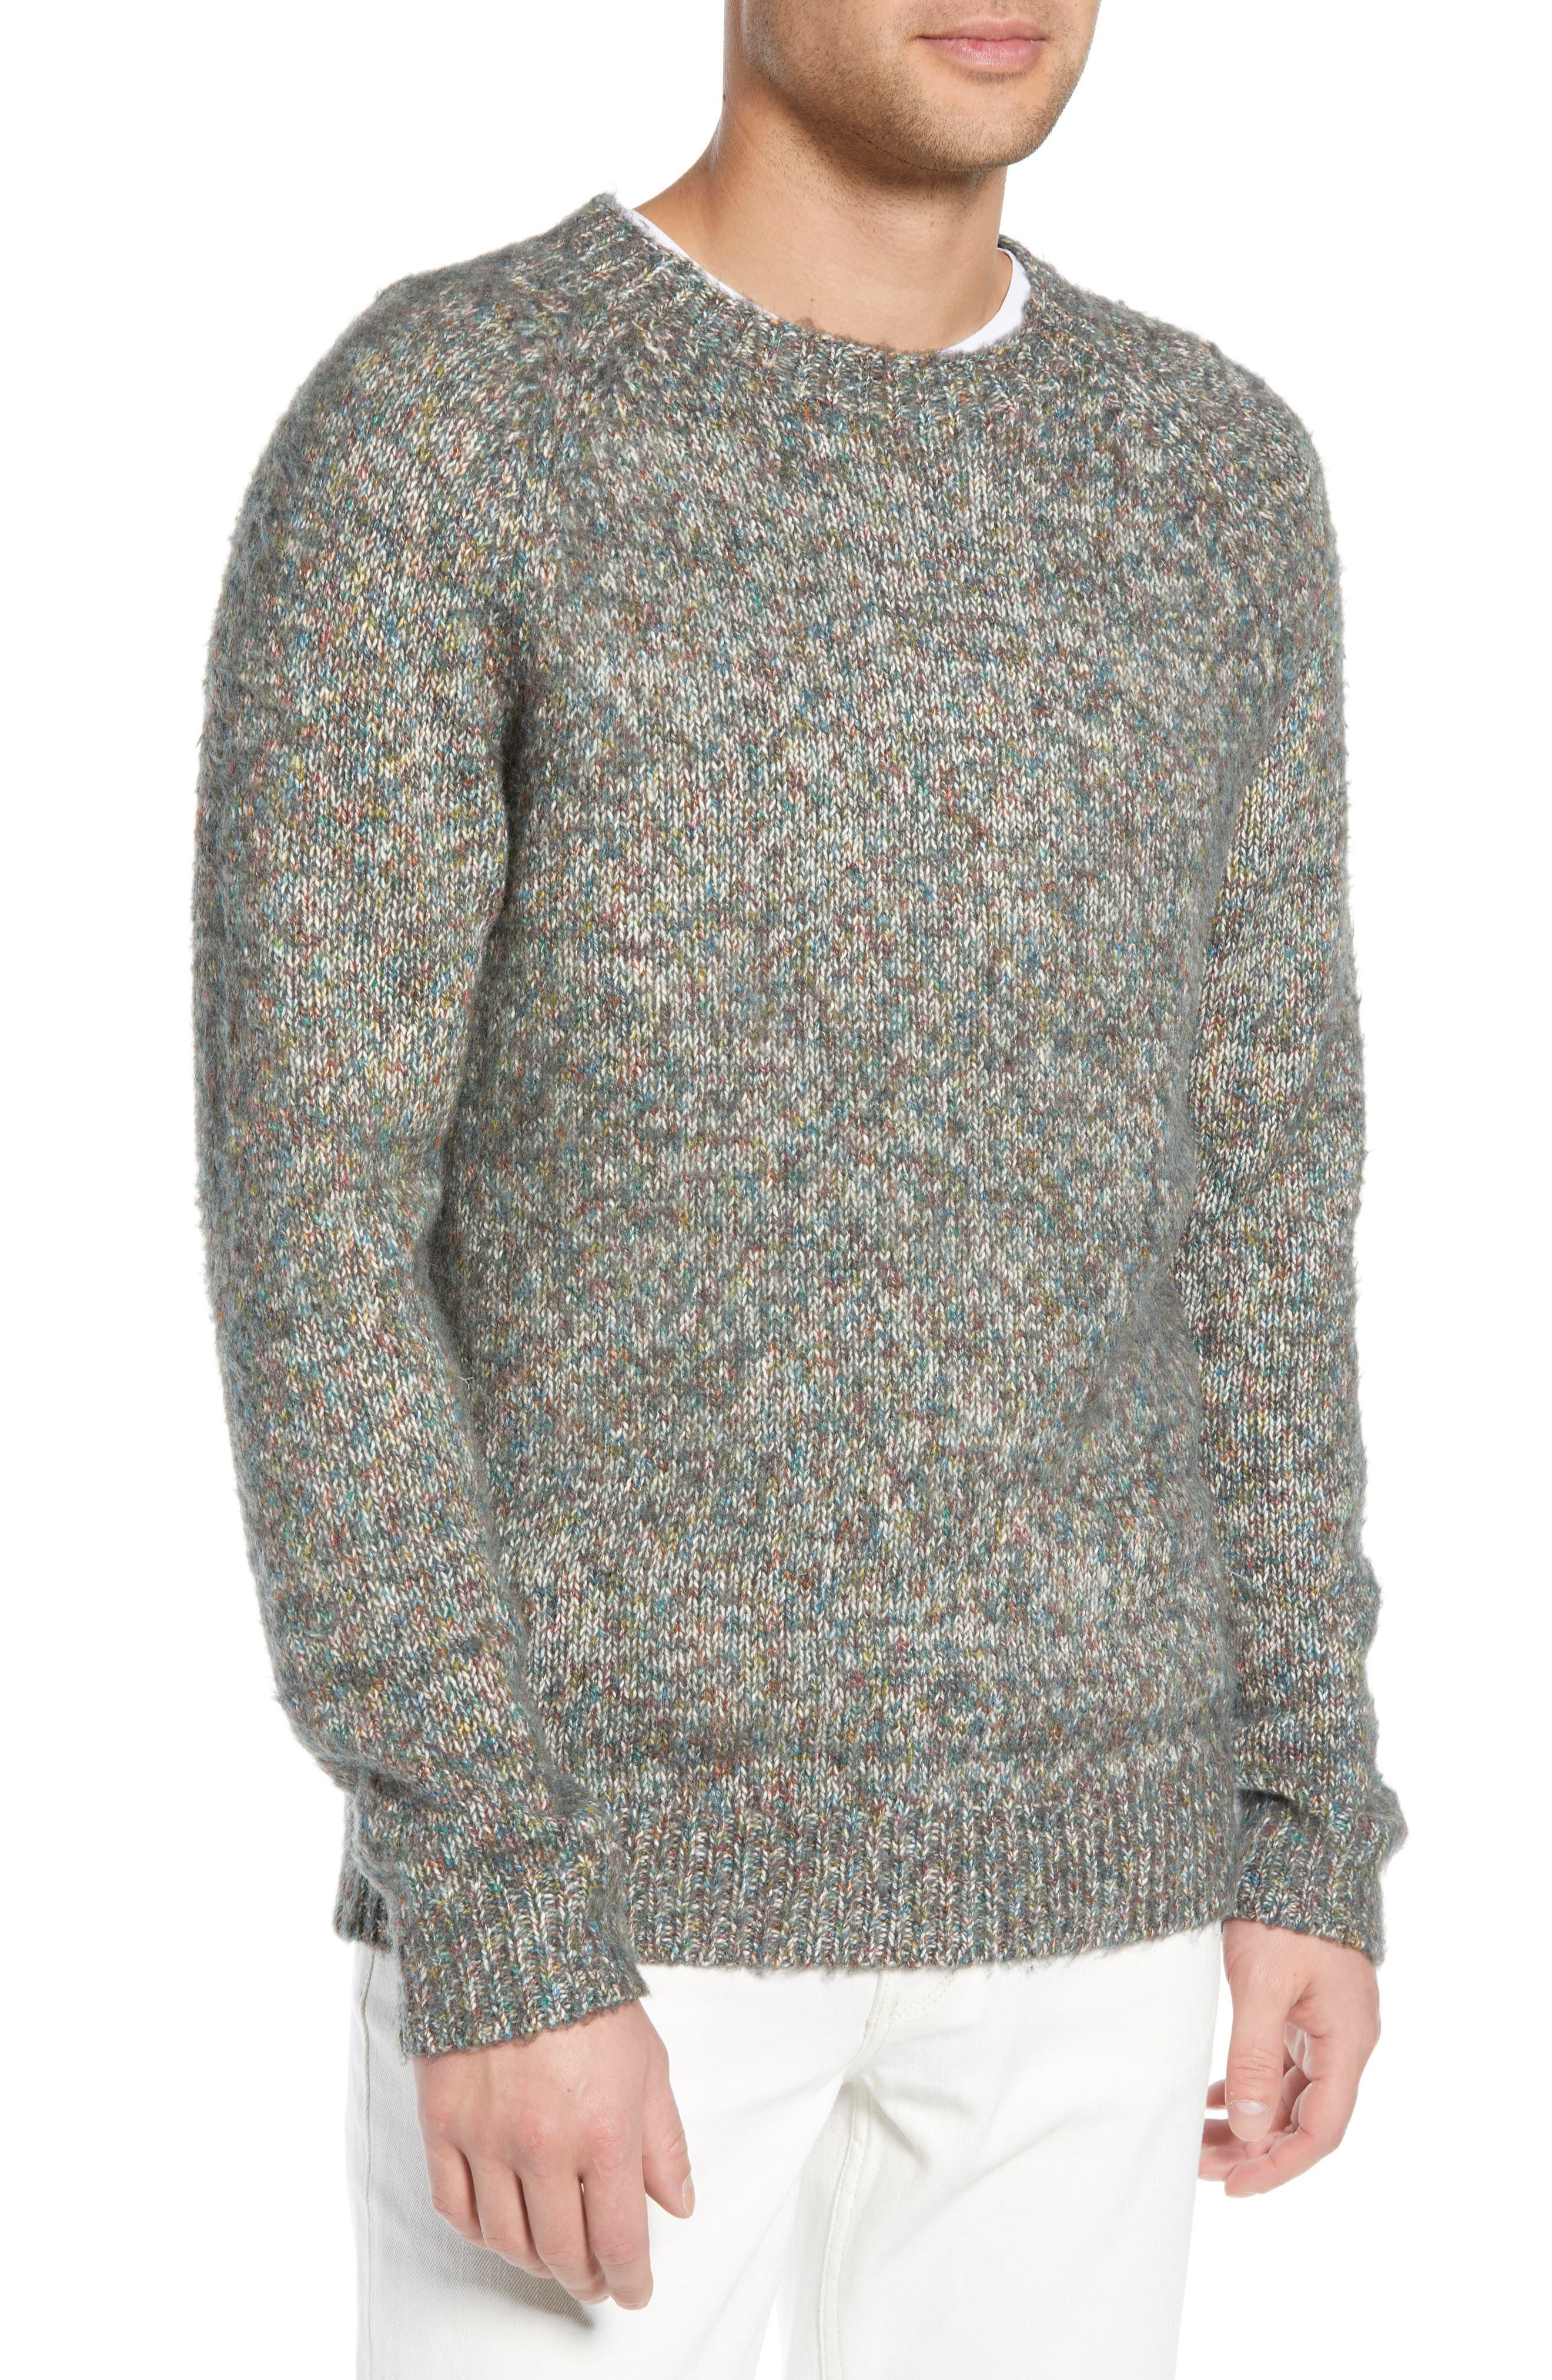 Image of Treasure & Bond Marled Crewneck Sweater